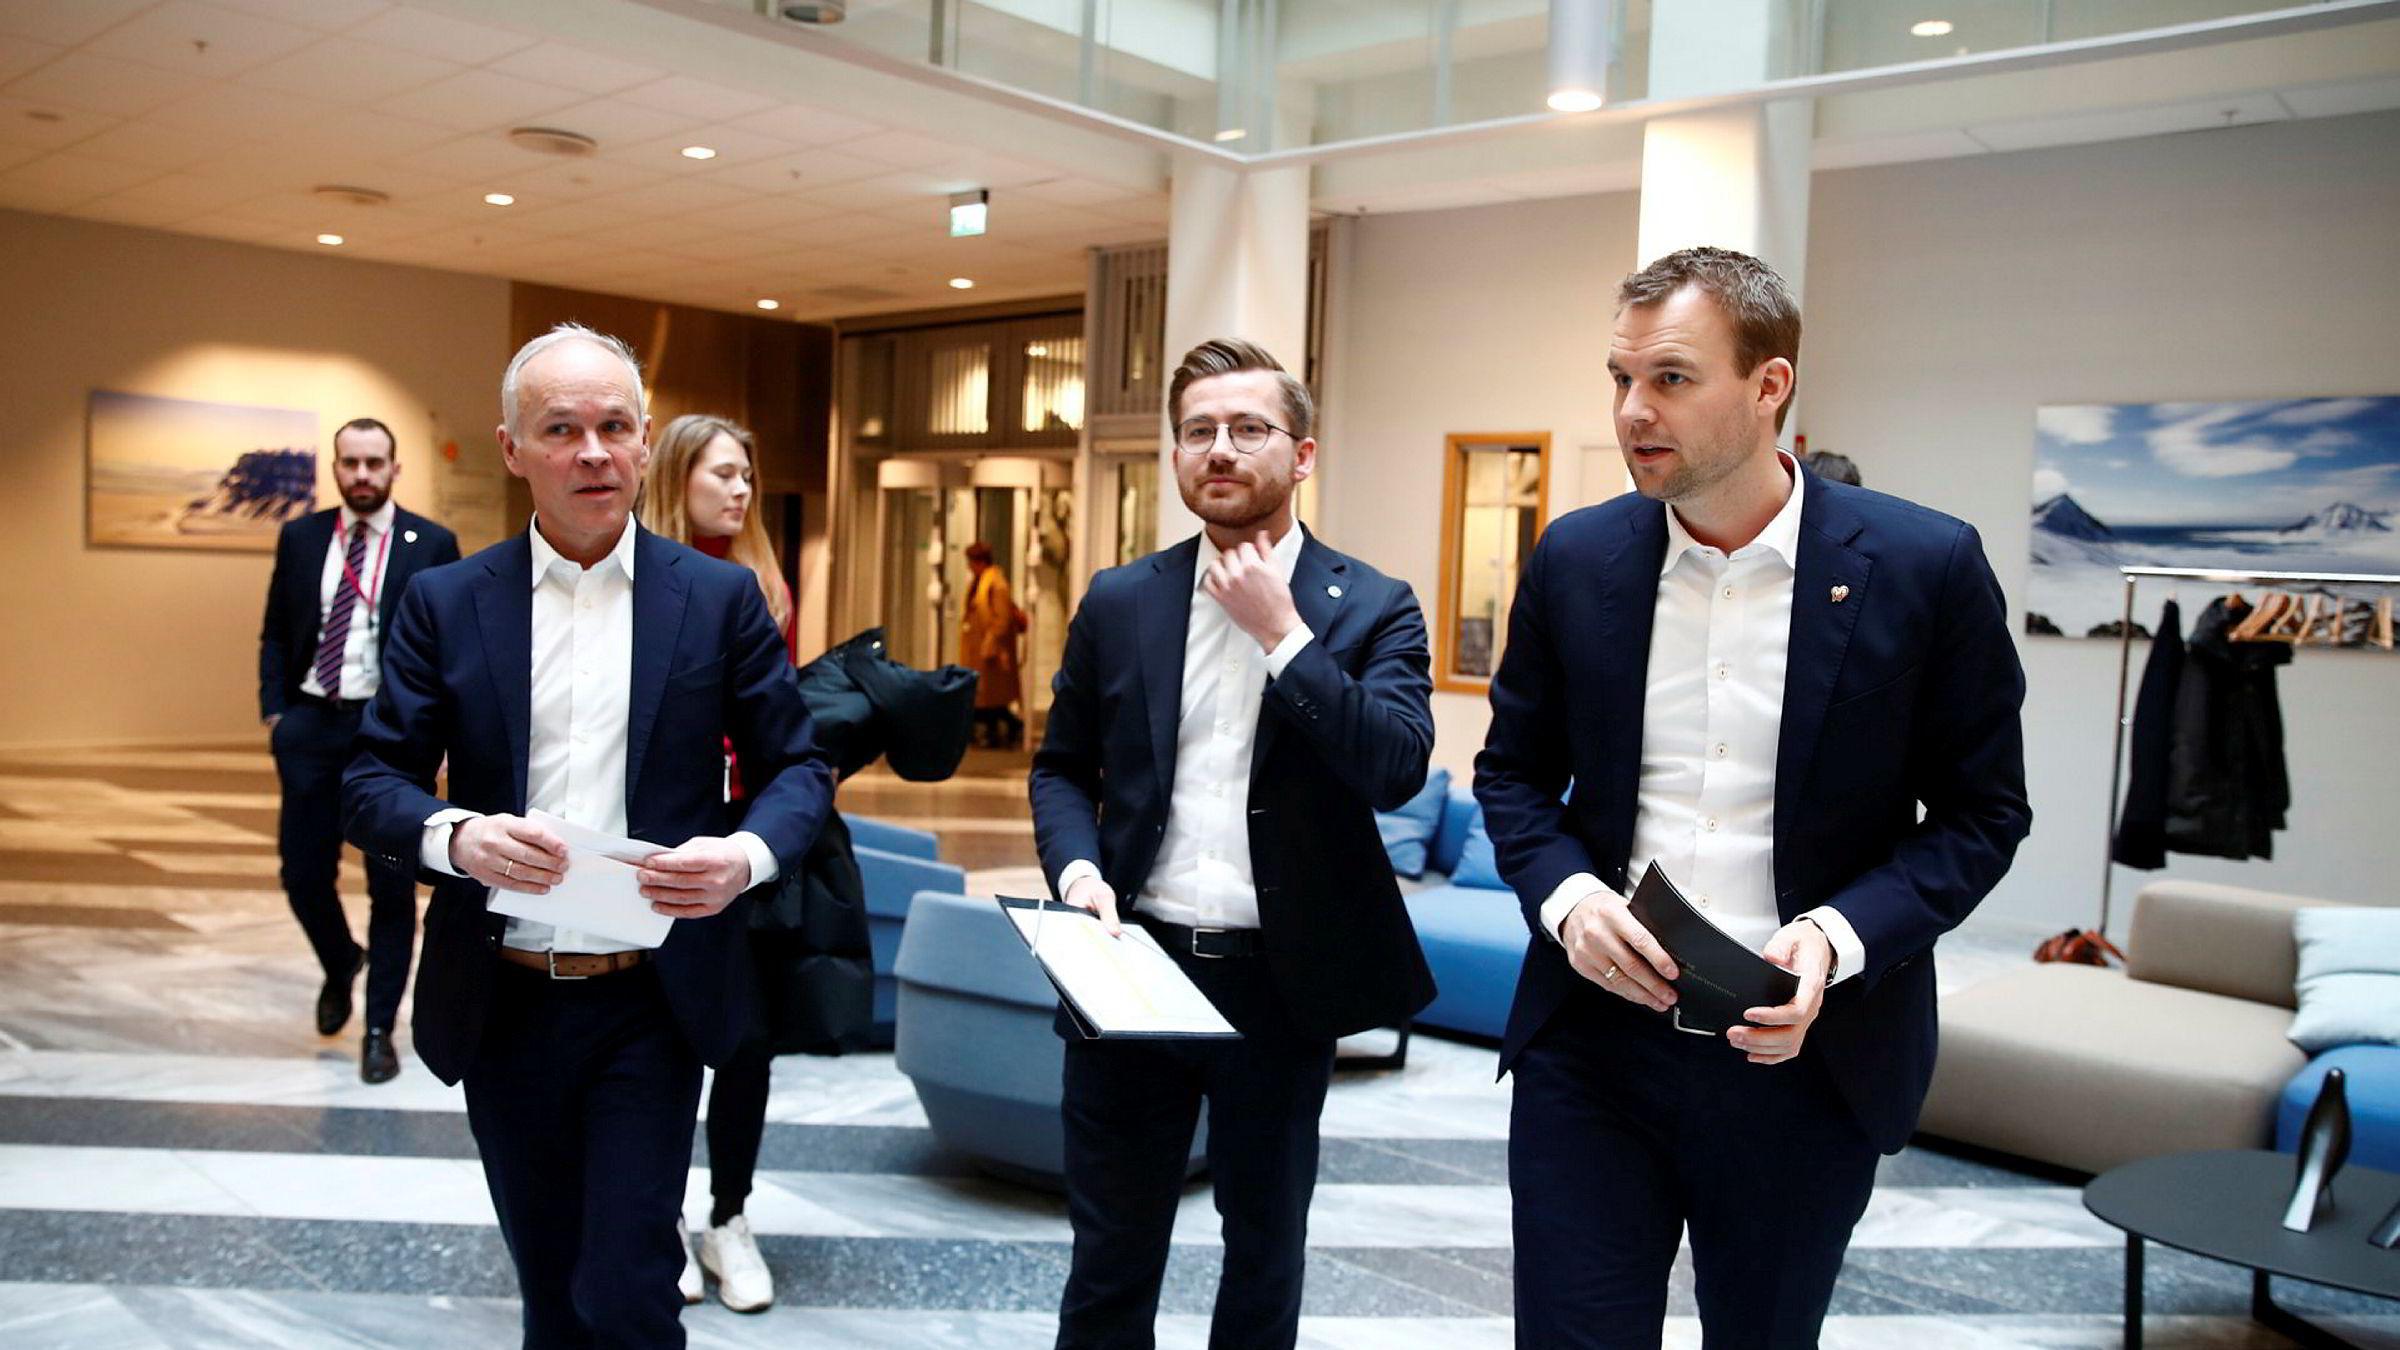 Finansminister Jan Tore Sanner (H) (f.v), klima- og miljøminister Sveinung Rotevatn (V) og barne- og familieminister Kjell Ingolf Ropstad (KrF) før en pressekonferanse om Norges forsterkede klimamål for 2030.